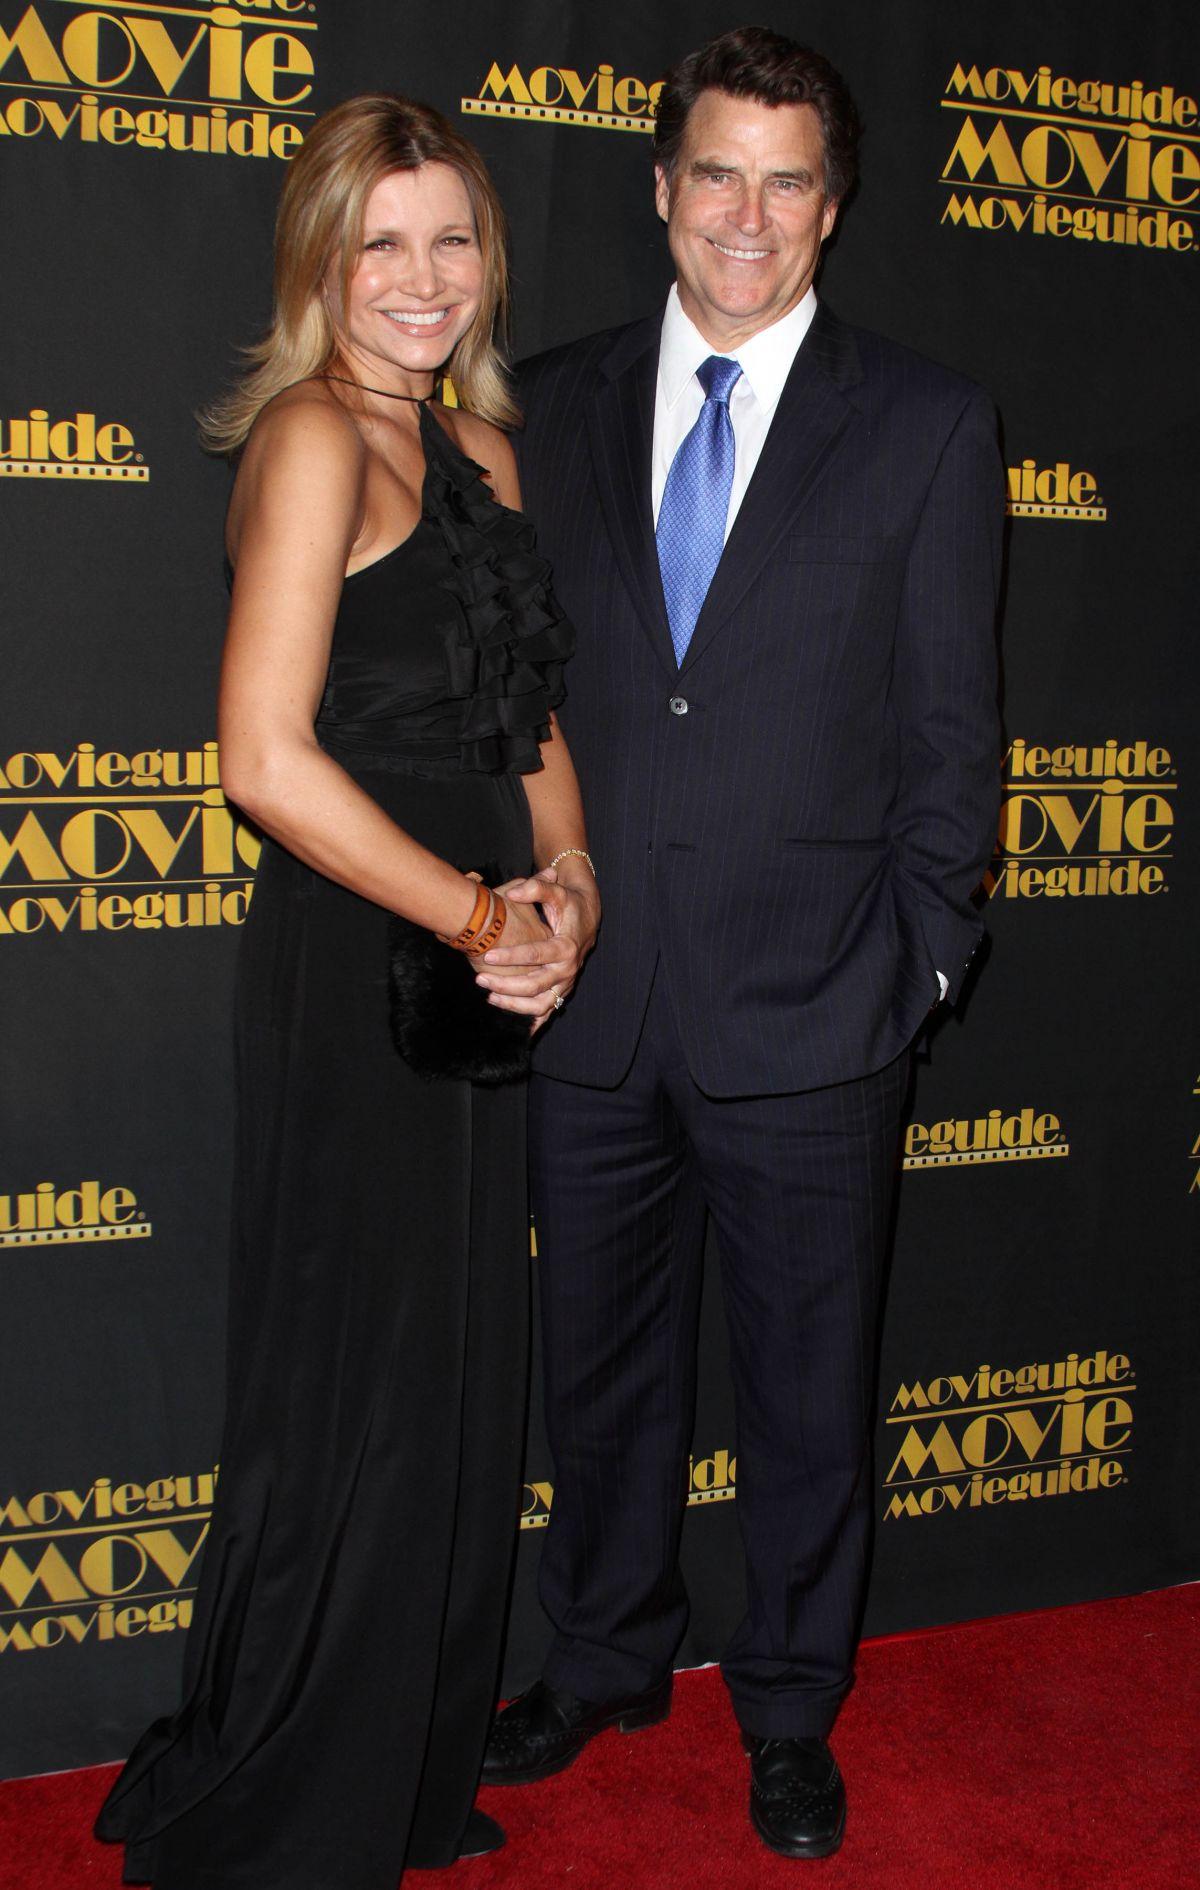 McKenzie Lee Erotic pic Catherine Hicks born August 6, 1951 (age 67),Mary Carey (actress)